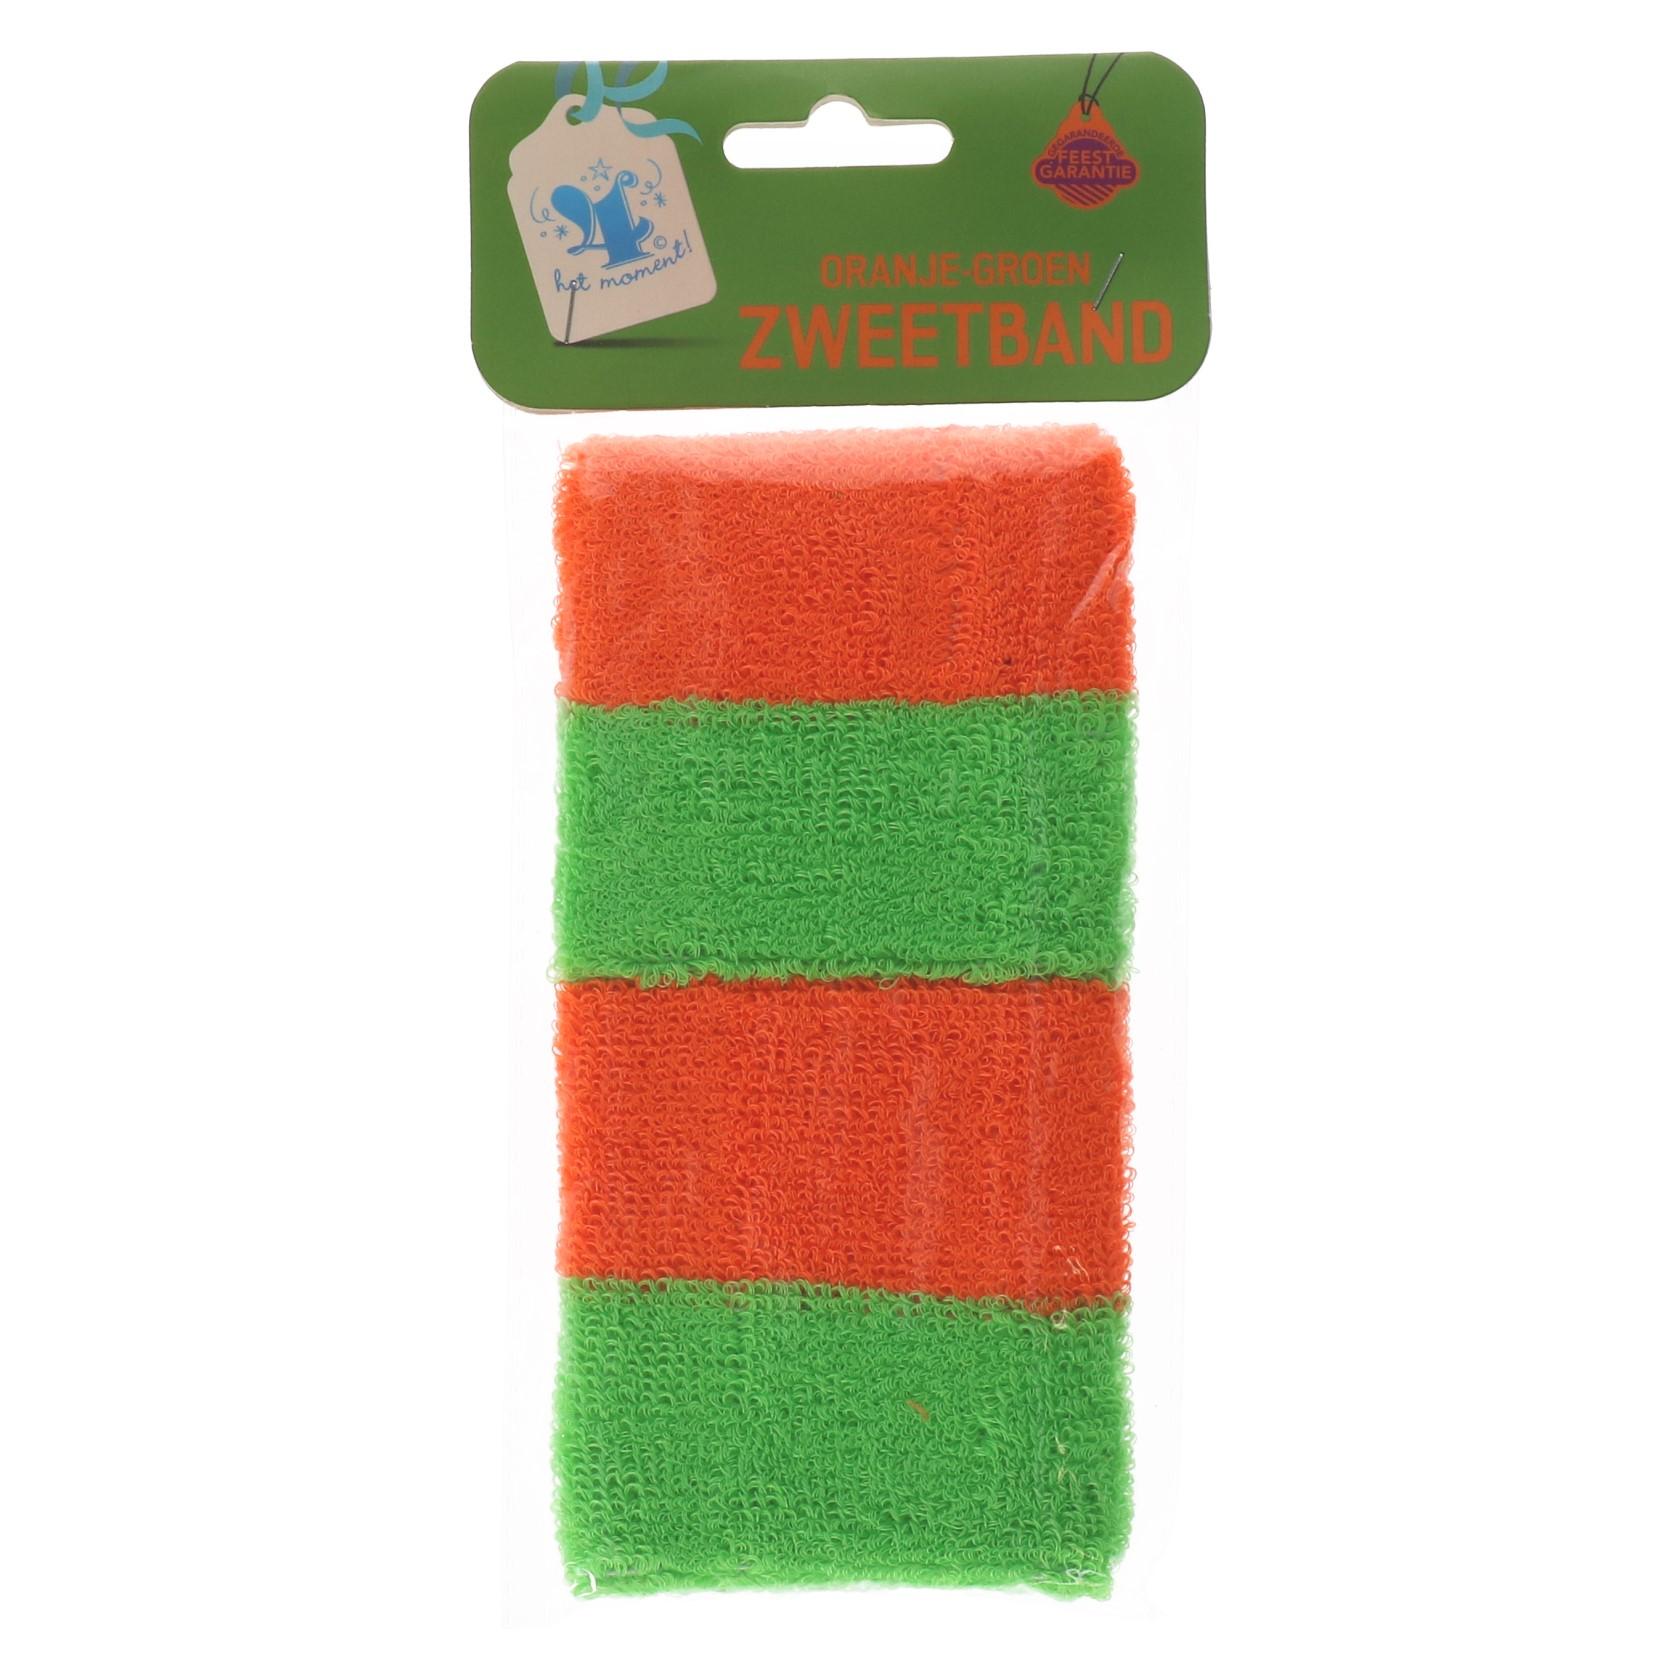 Zweetband oranje/groen